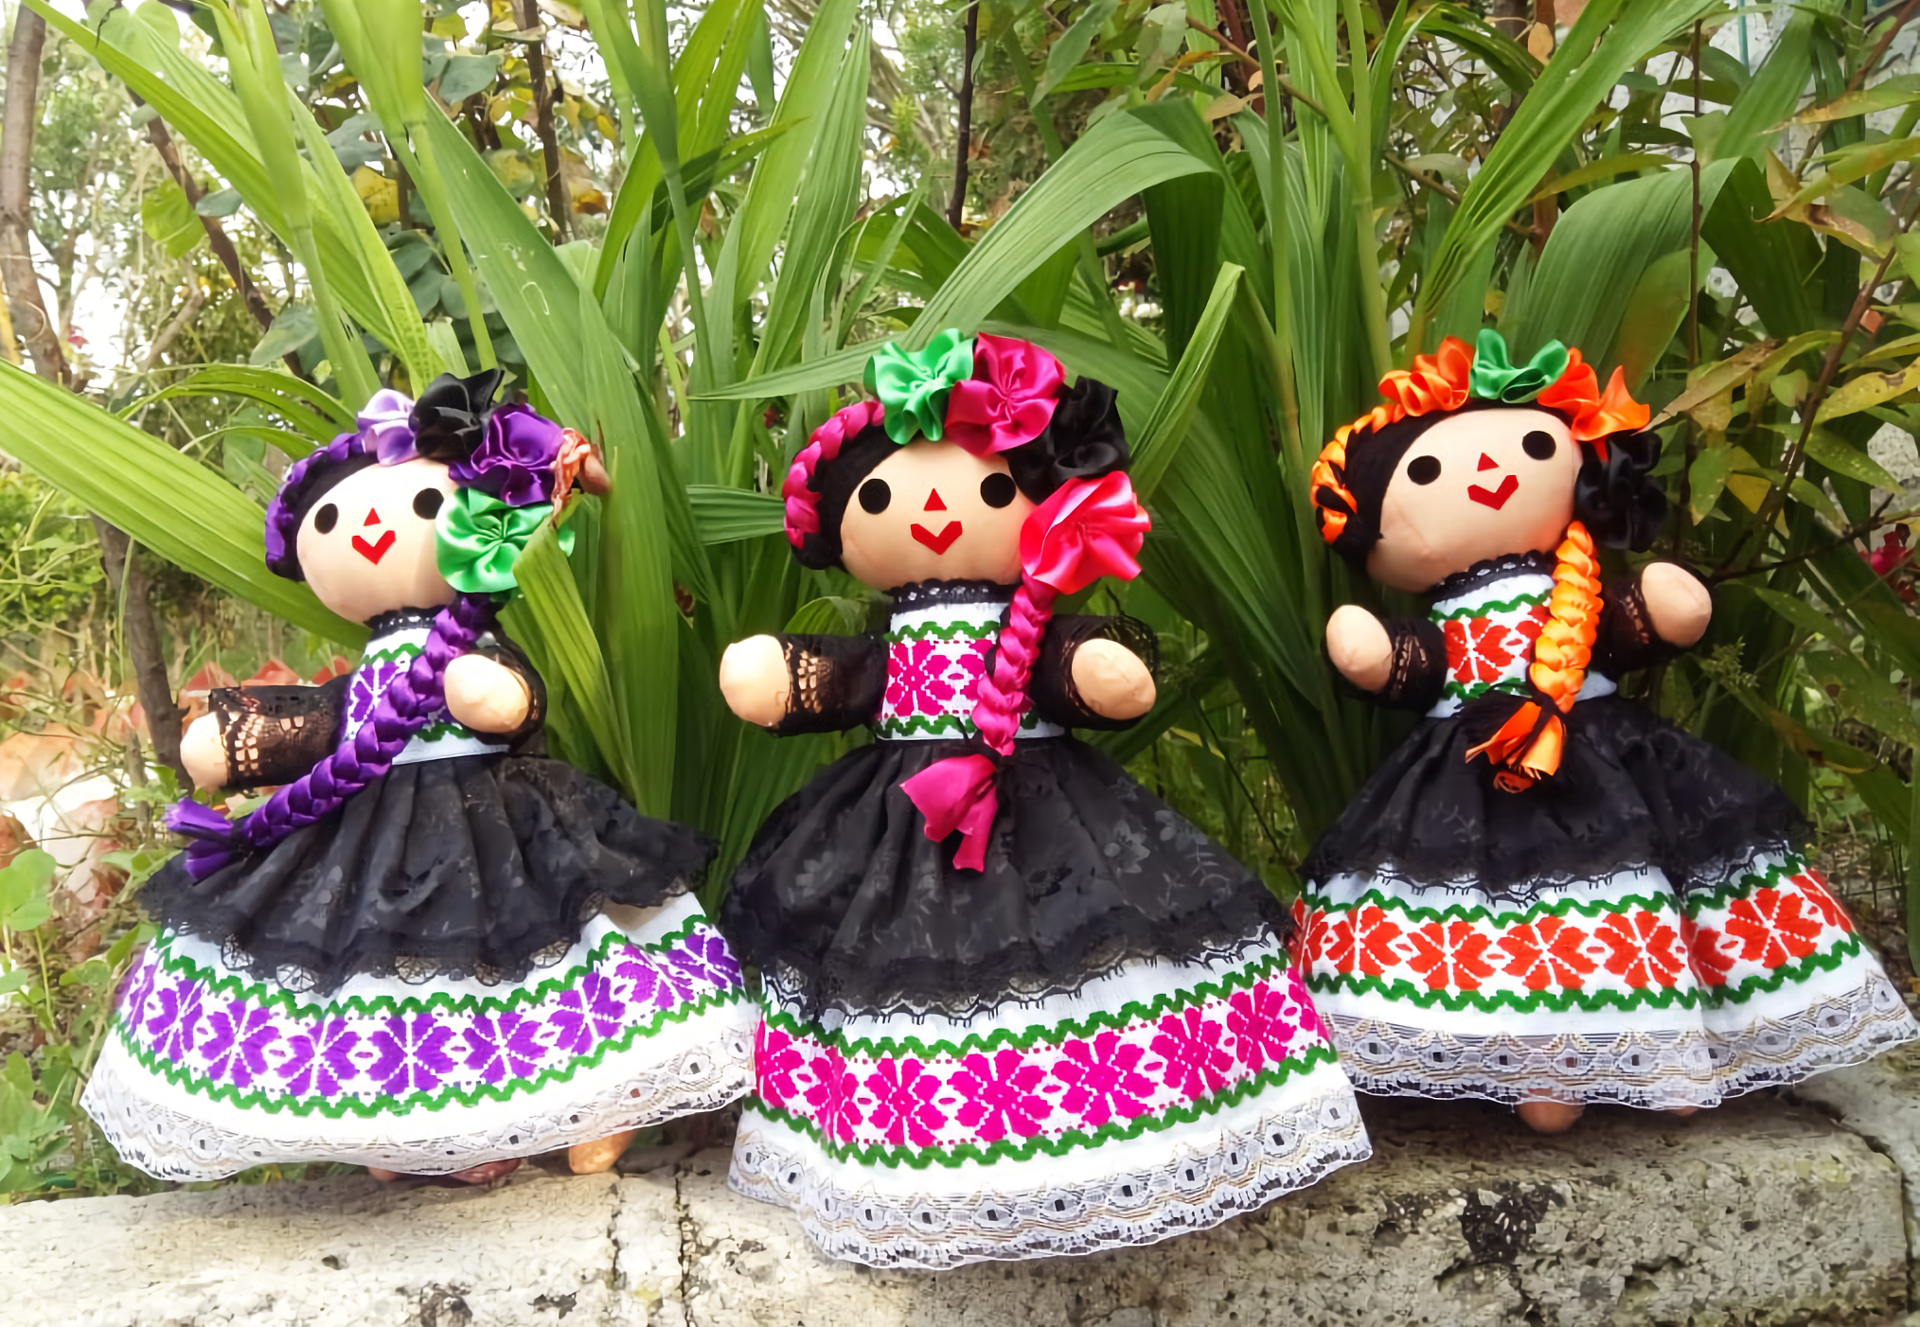 Muñecas Lele otomíes